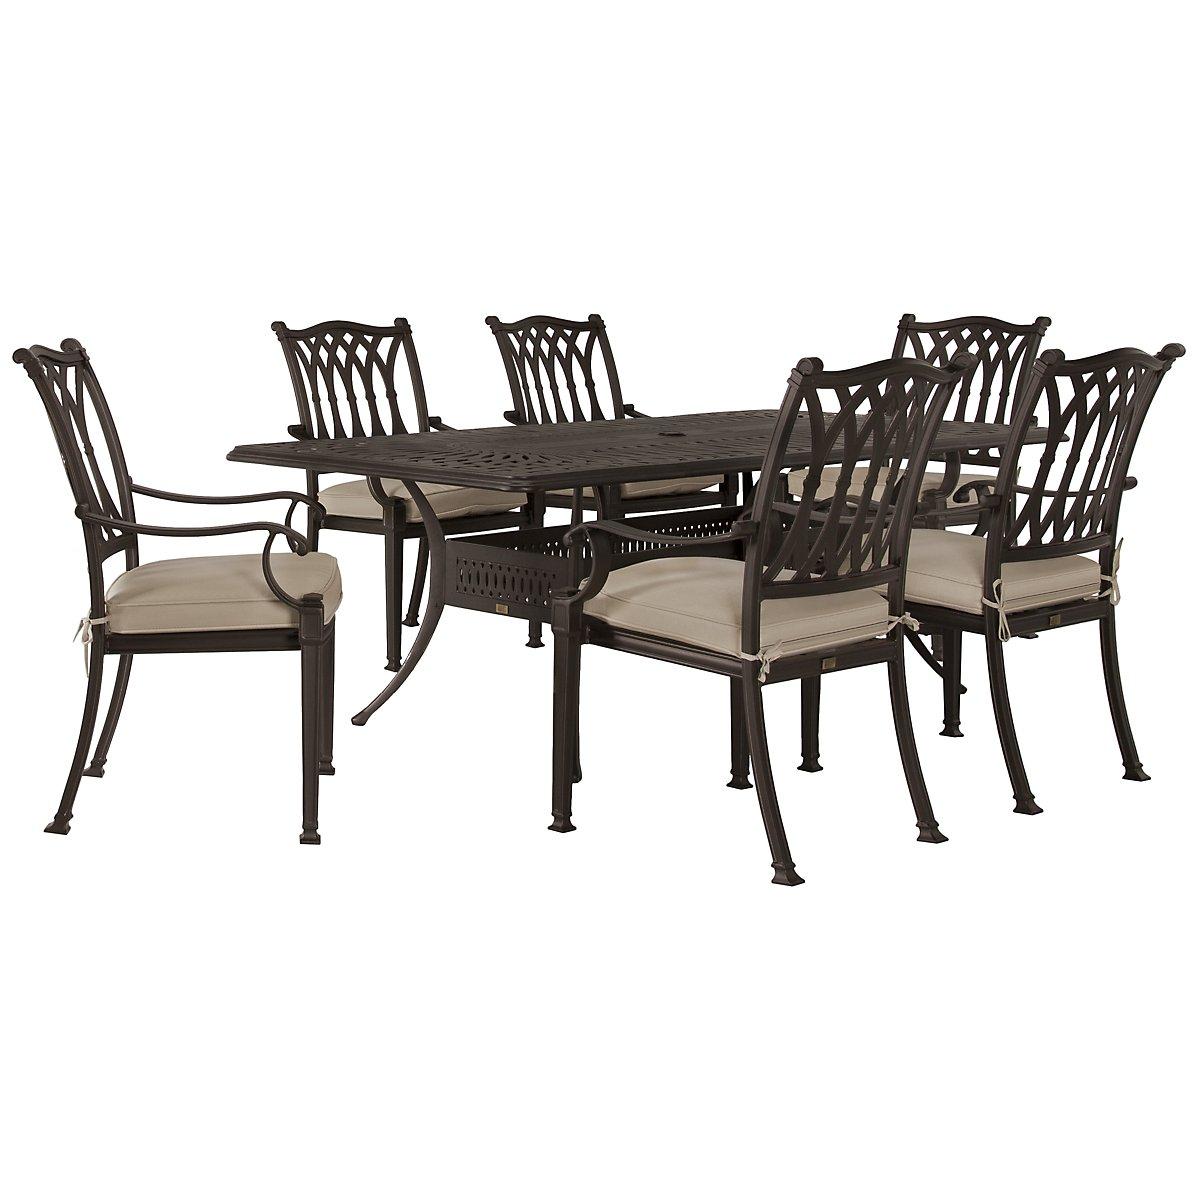 "Primera Dark Tone 87"" Rectangular Table & 4 Cushioned Chairs"